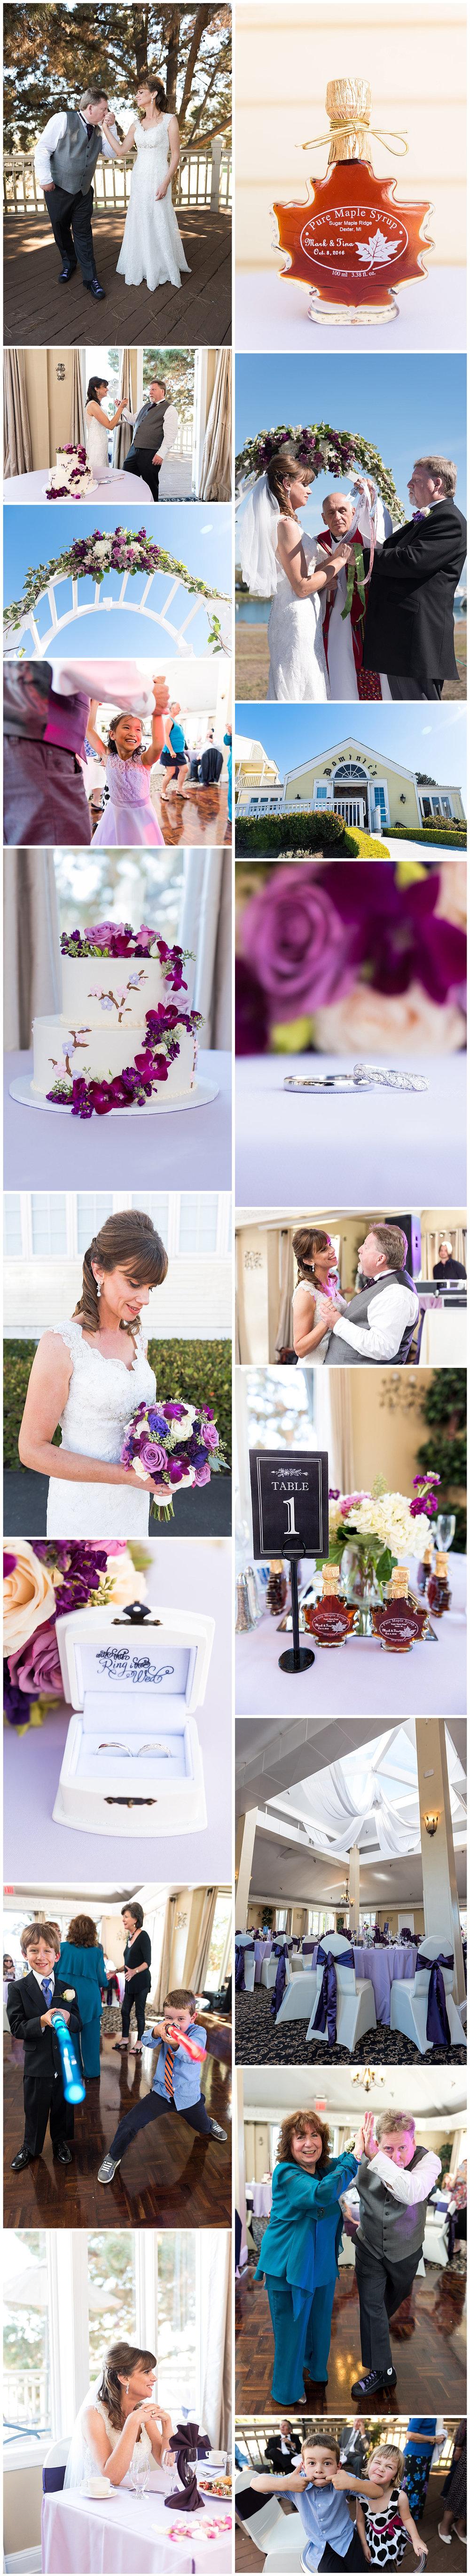 Tina&Mark Wedding